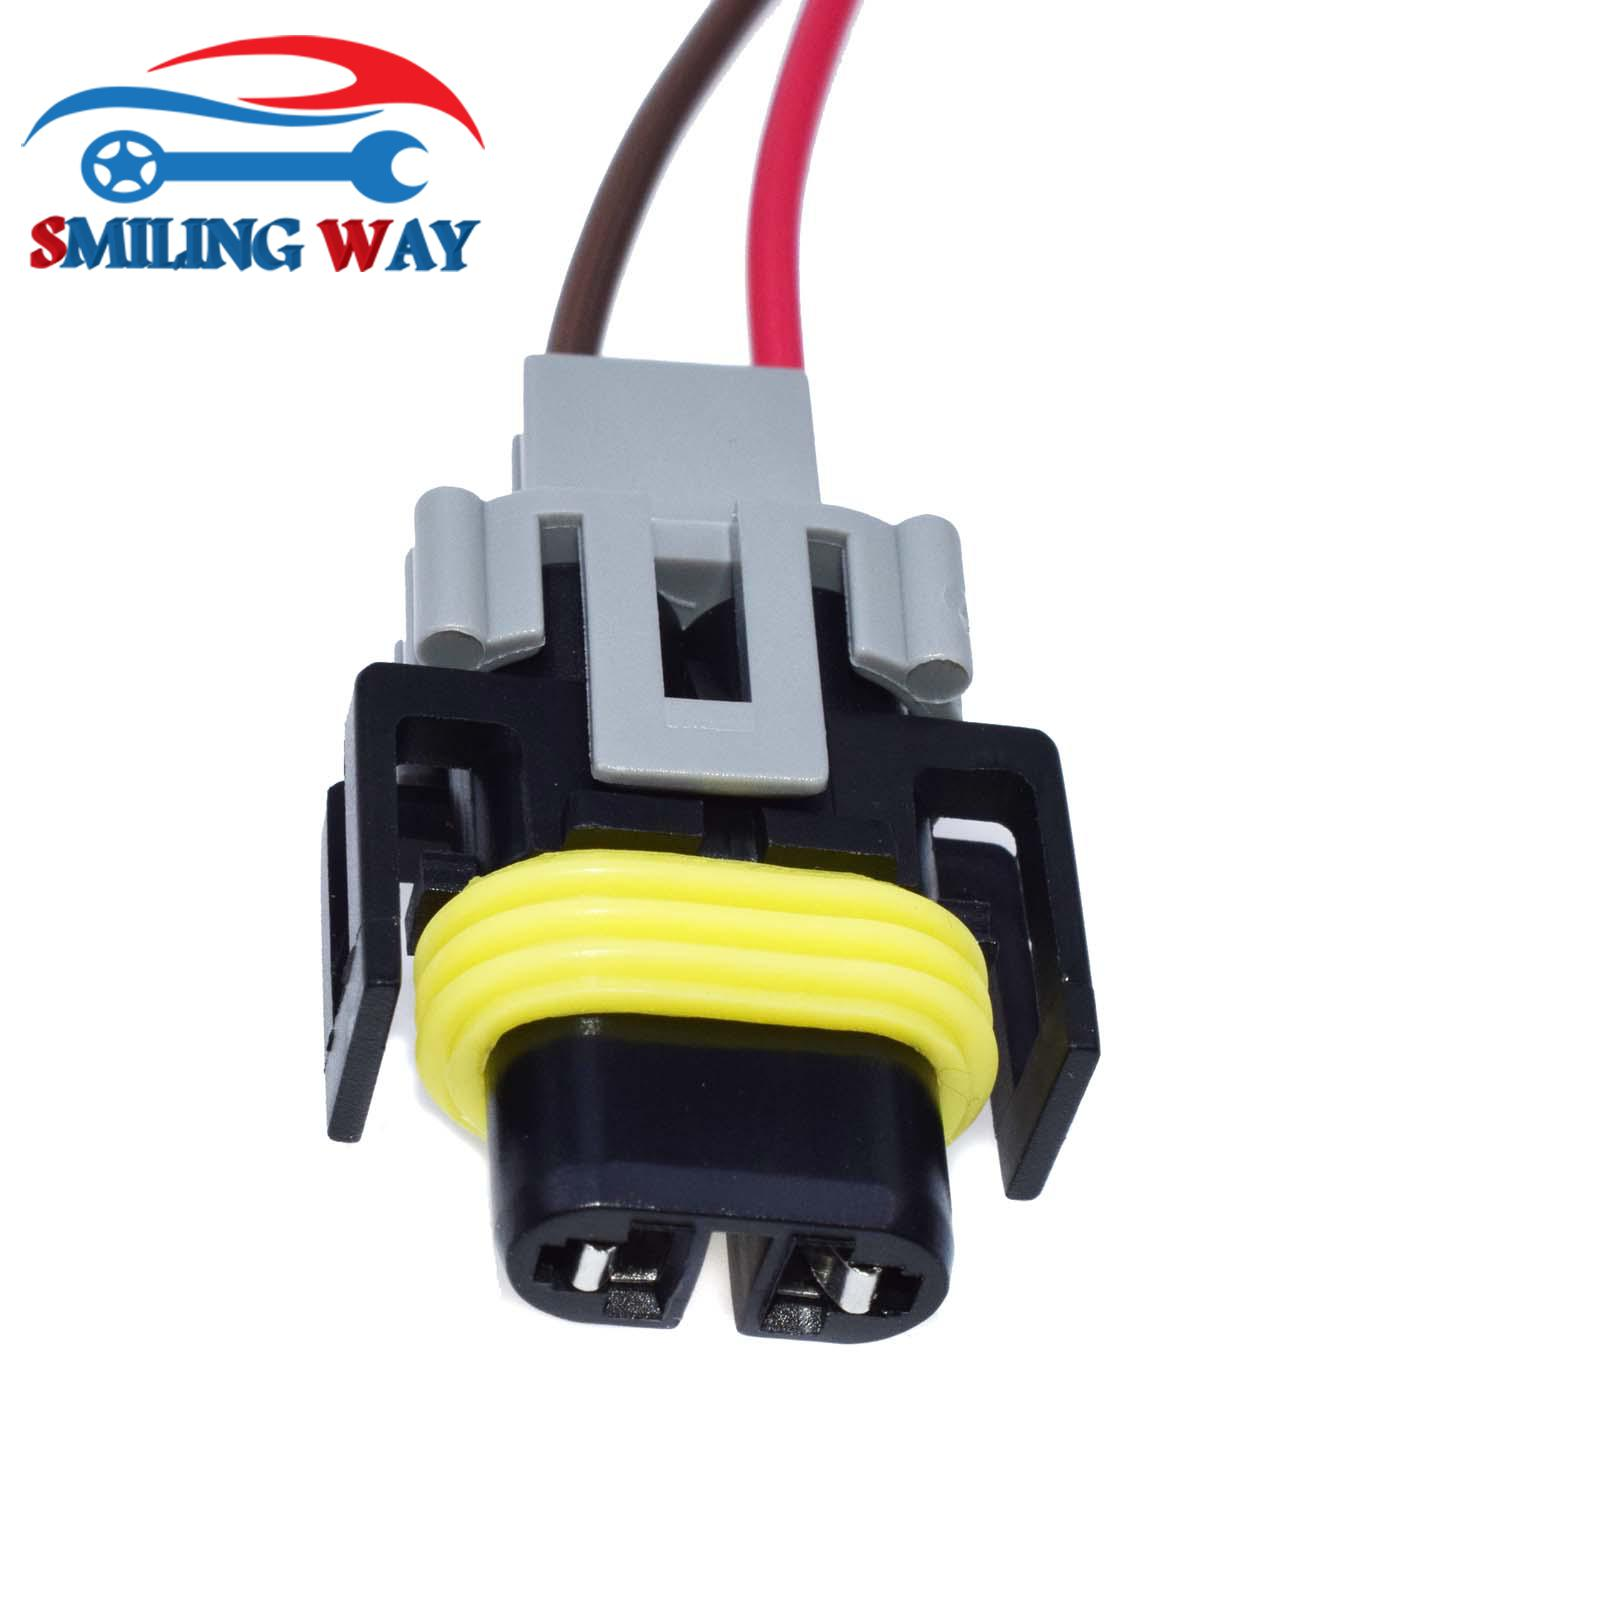 5 Pcs ABS Wheel Speed Sensor Connector Pigtail Wiring For Camaro Firebird 93-02